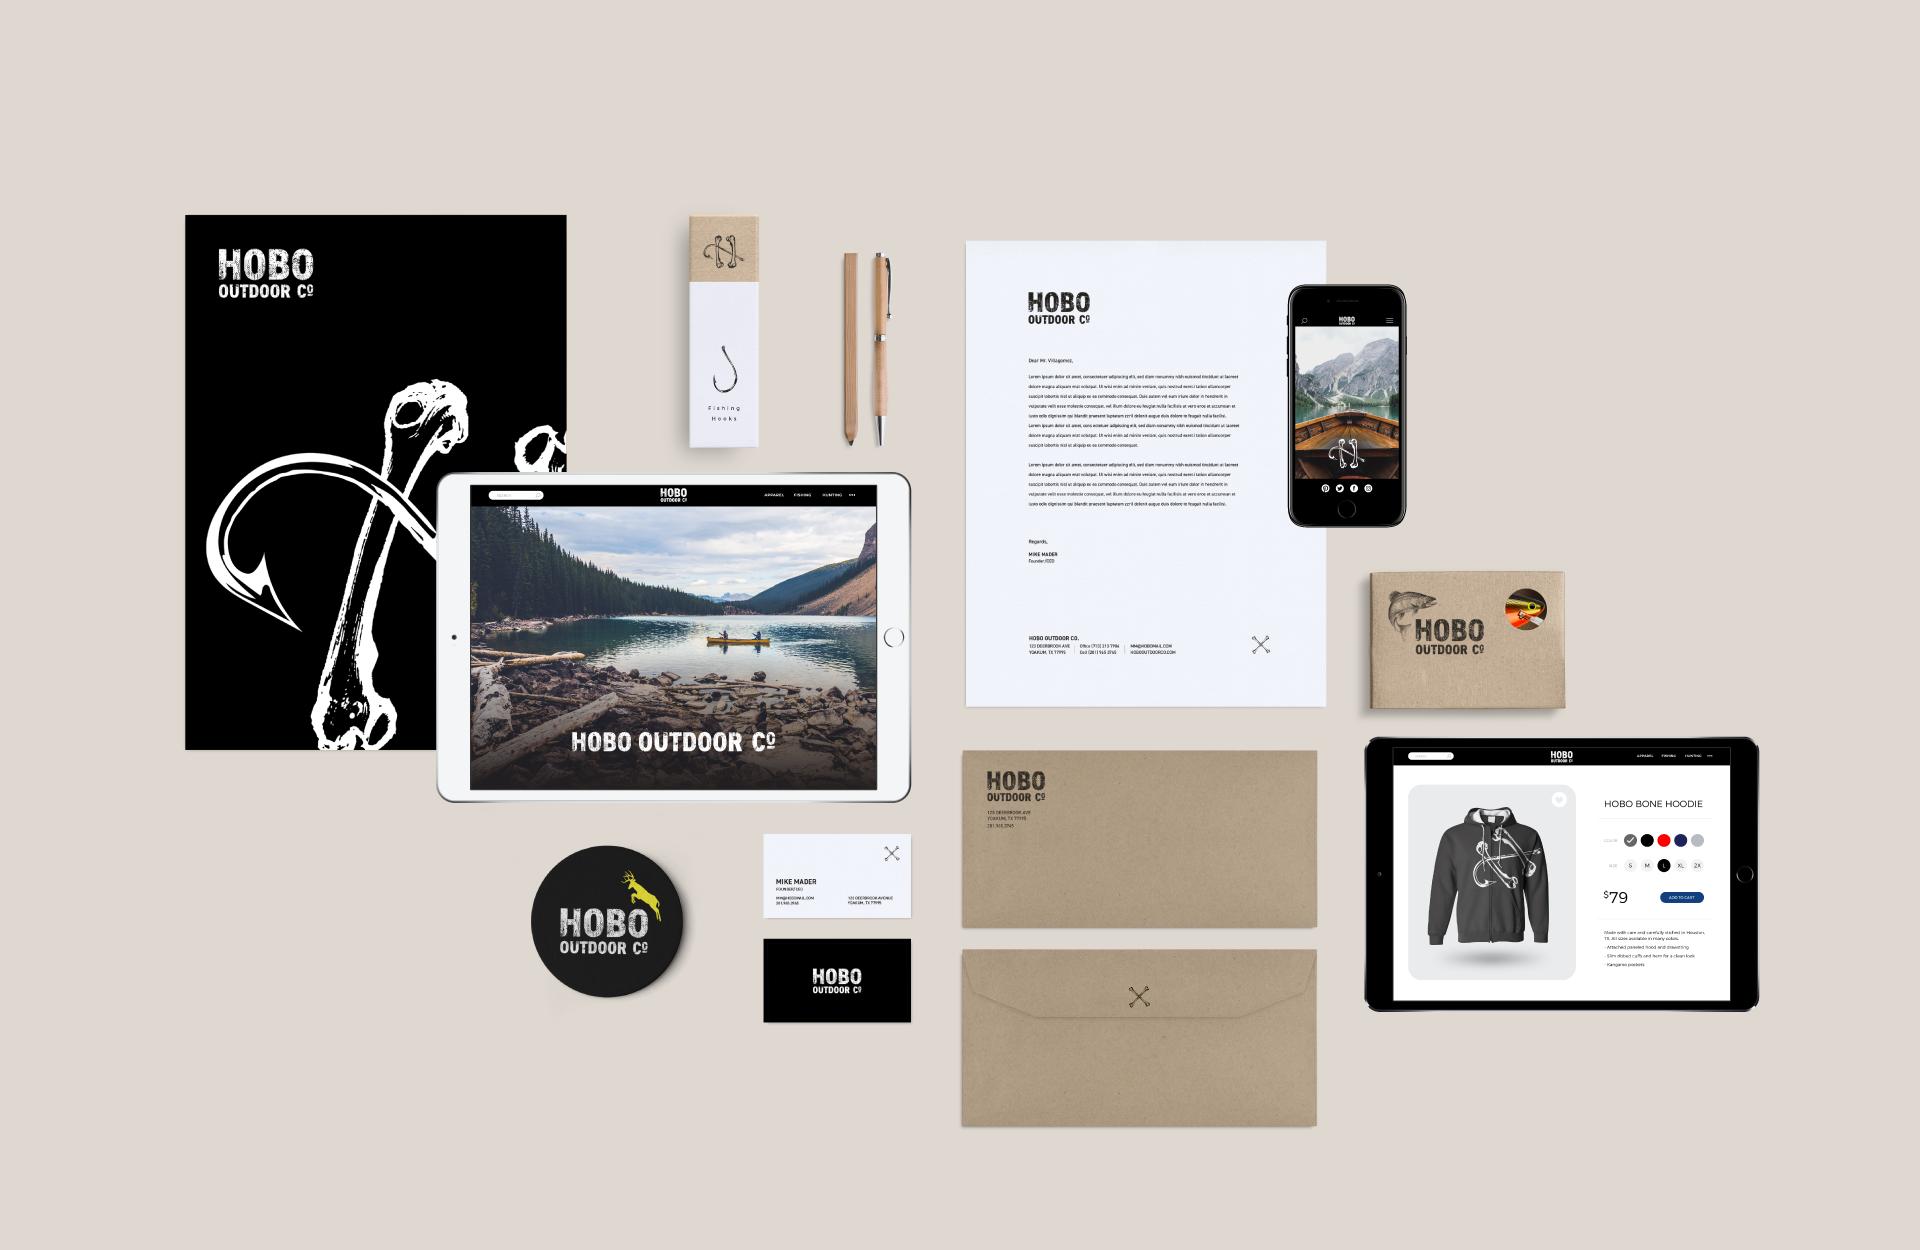 Hobo Outdoor Co. | Branding | The Underground Design Studio